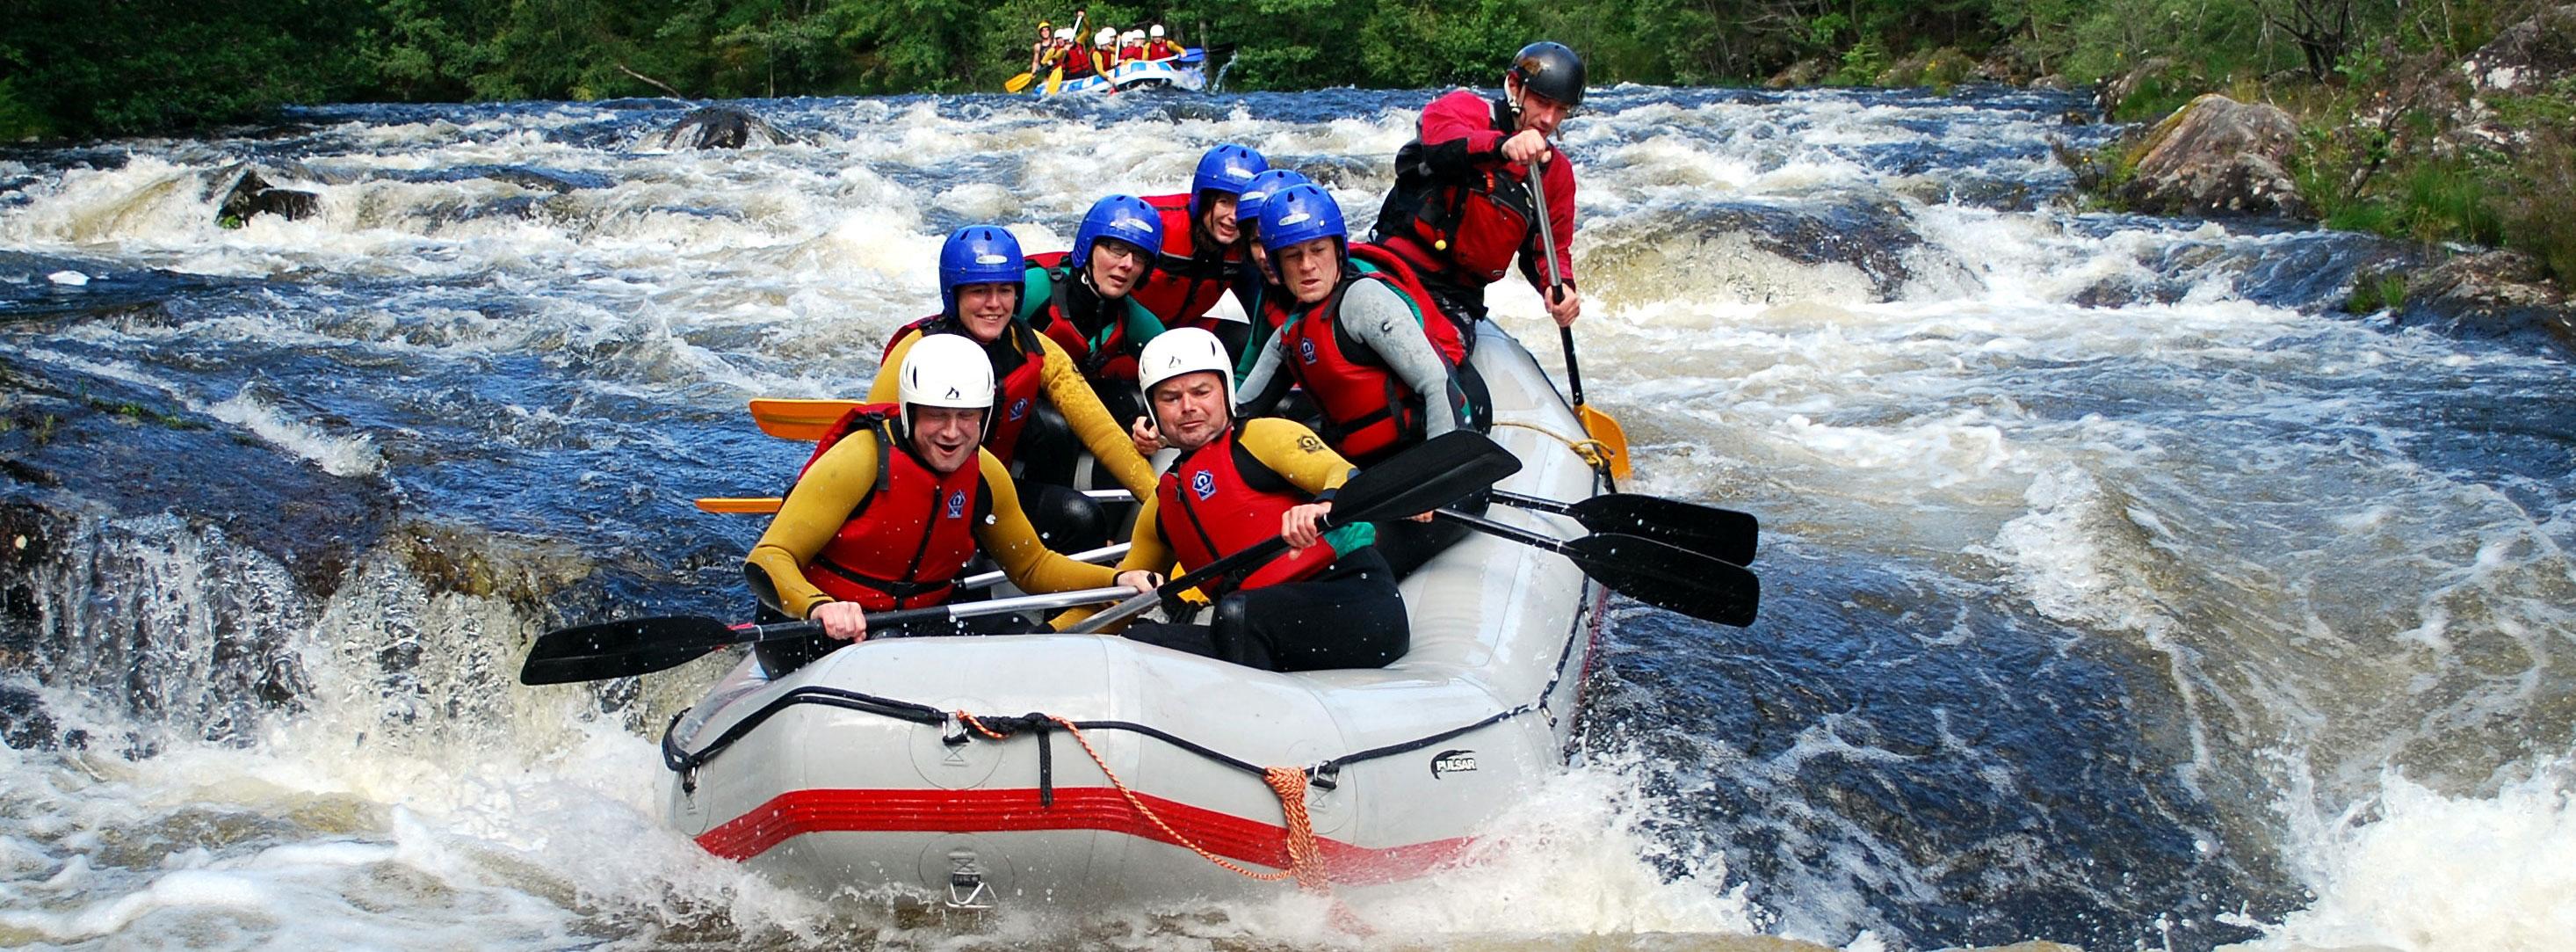 Adenture sports - Rafting